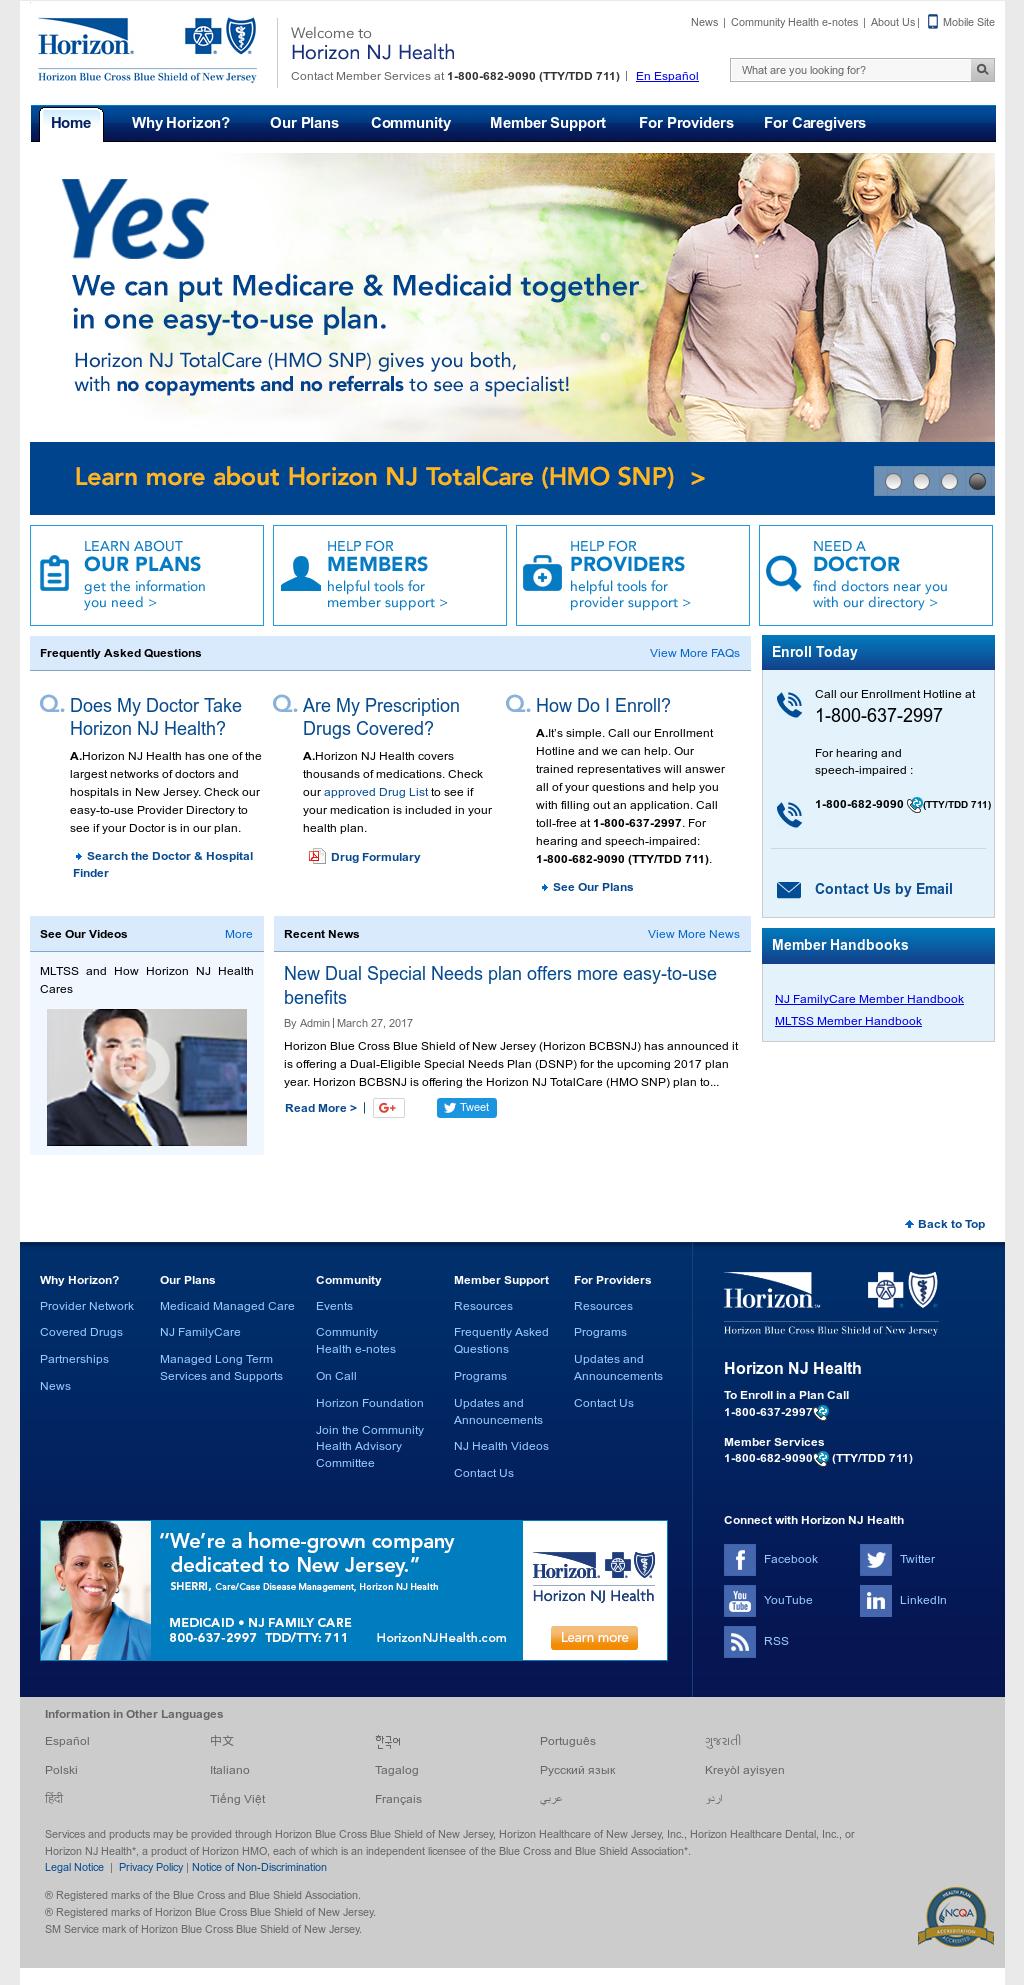 Horizon NJ Health Competitors, Revenue and Employees - Owler Company